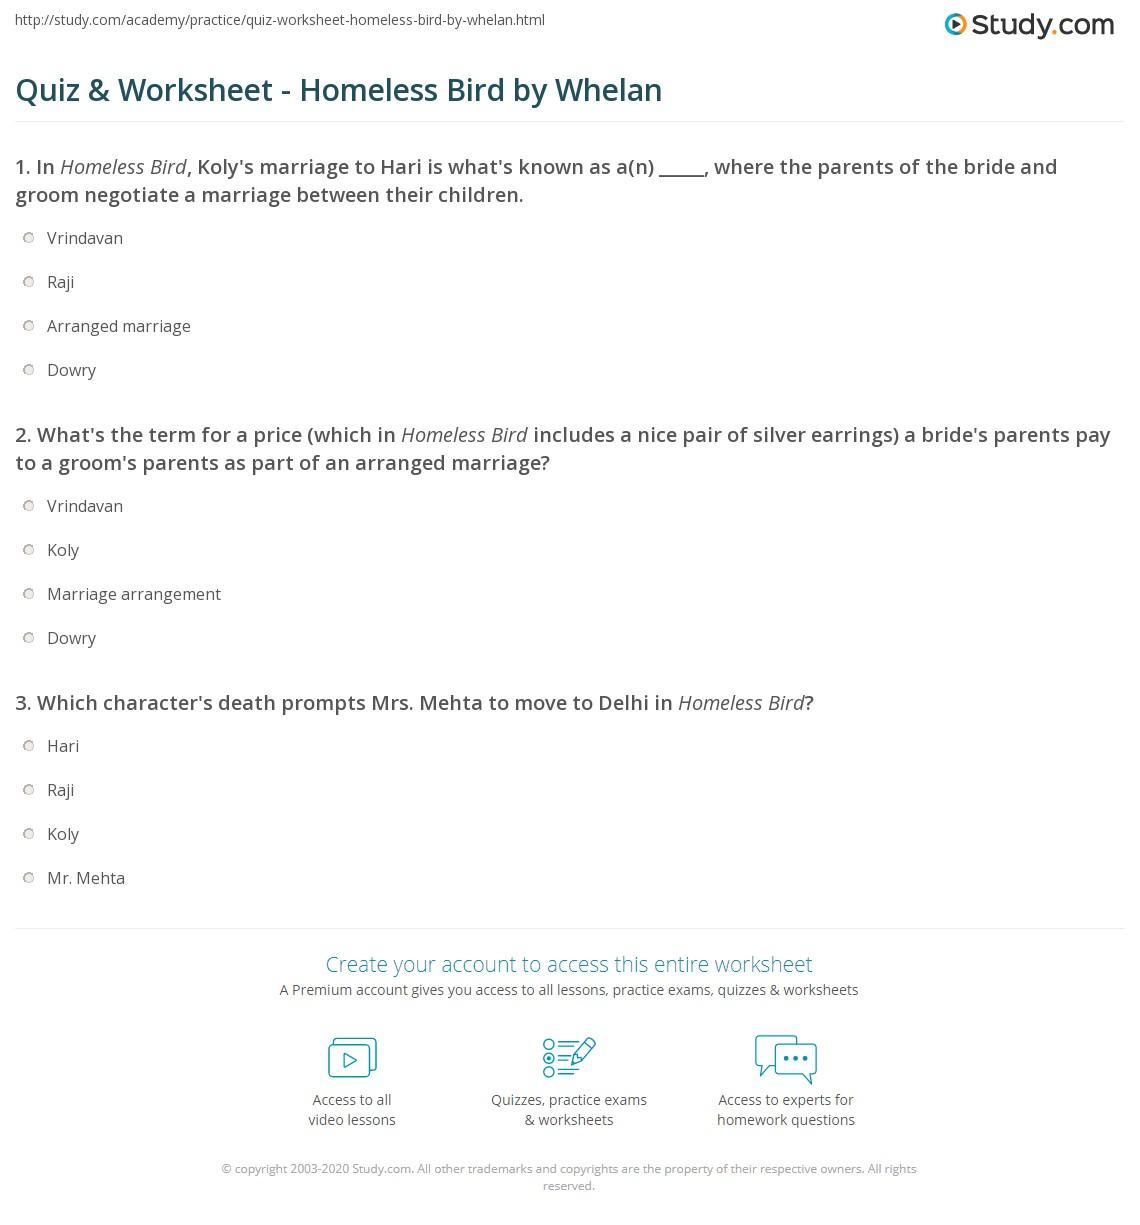 Quiz Worksheet Homeless Bird By Whelan Study Com